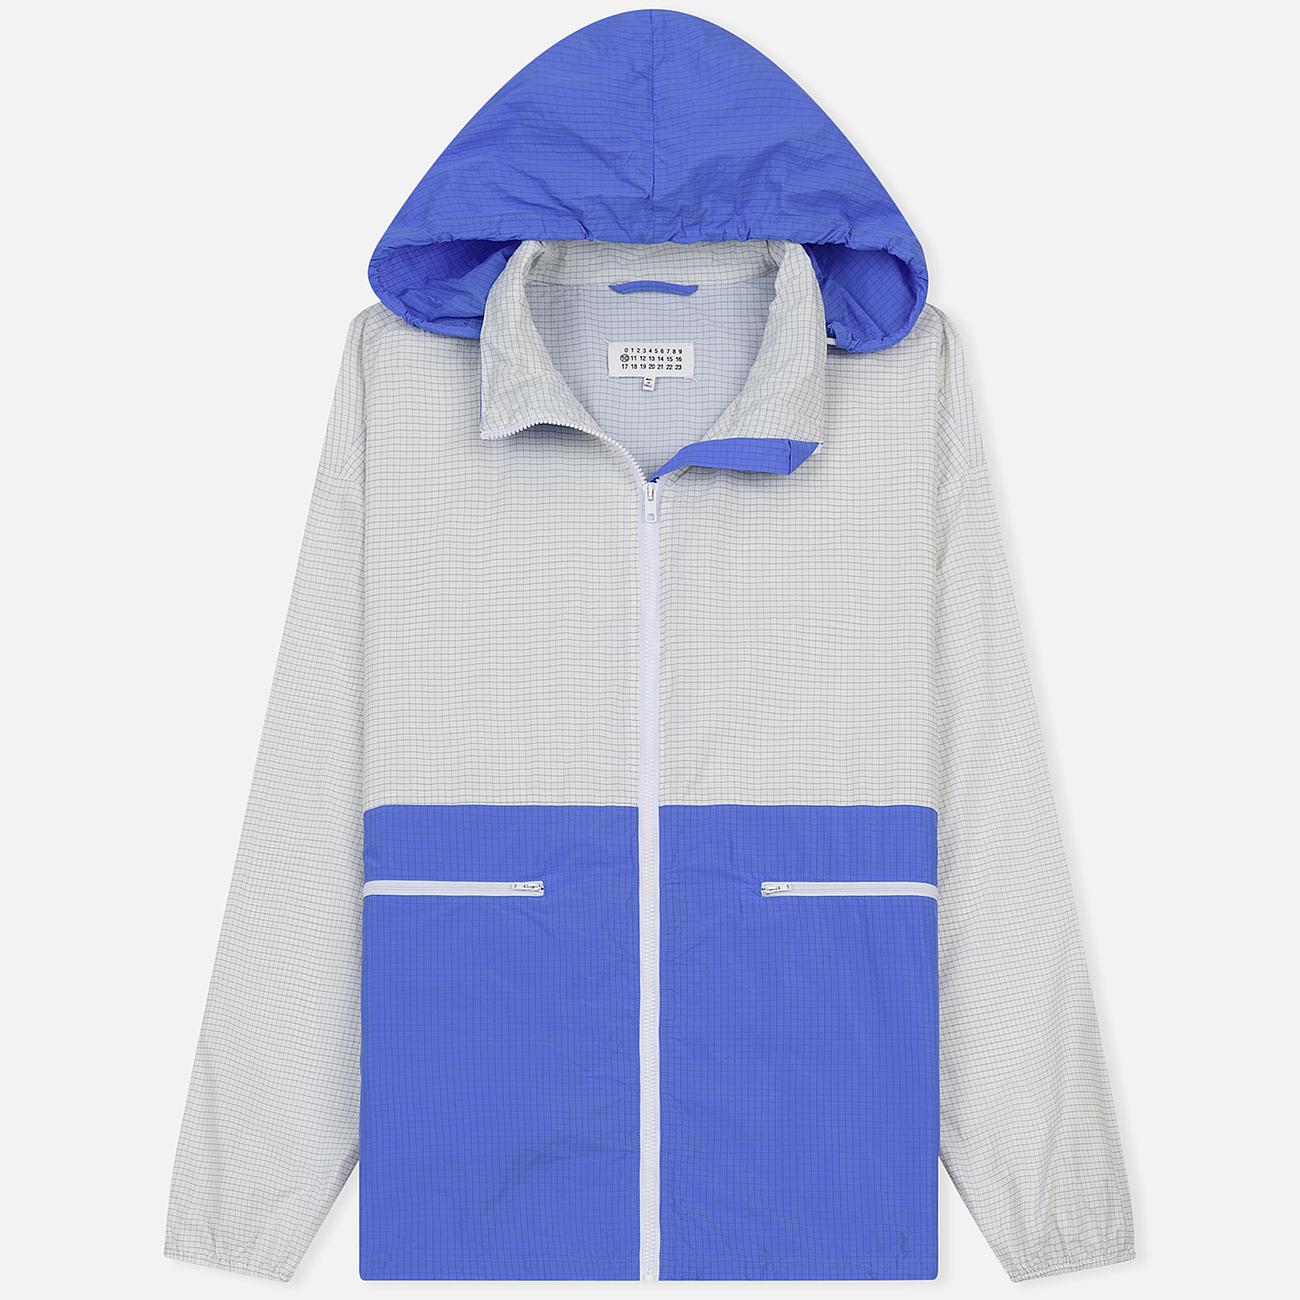 Мужская куртка ветровка Maison Margiela Anonymity Lining White